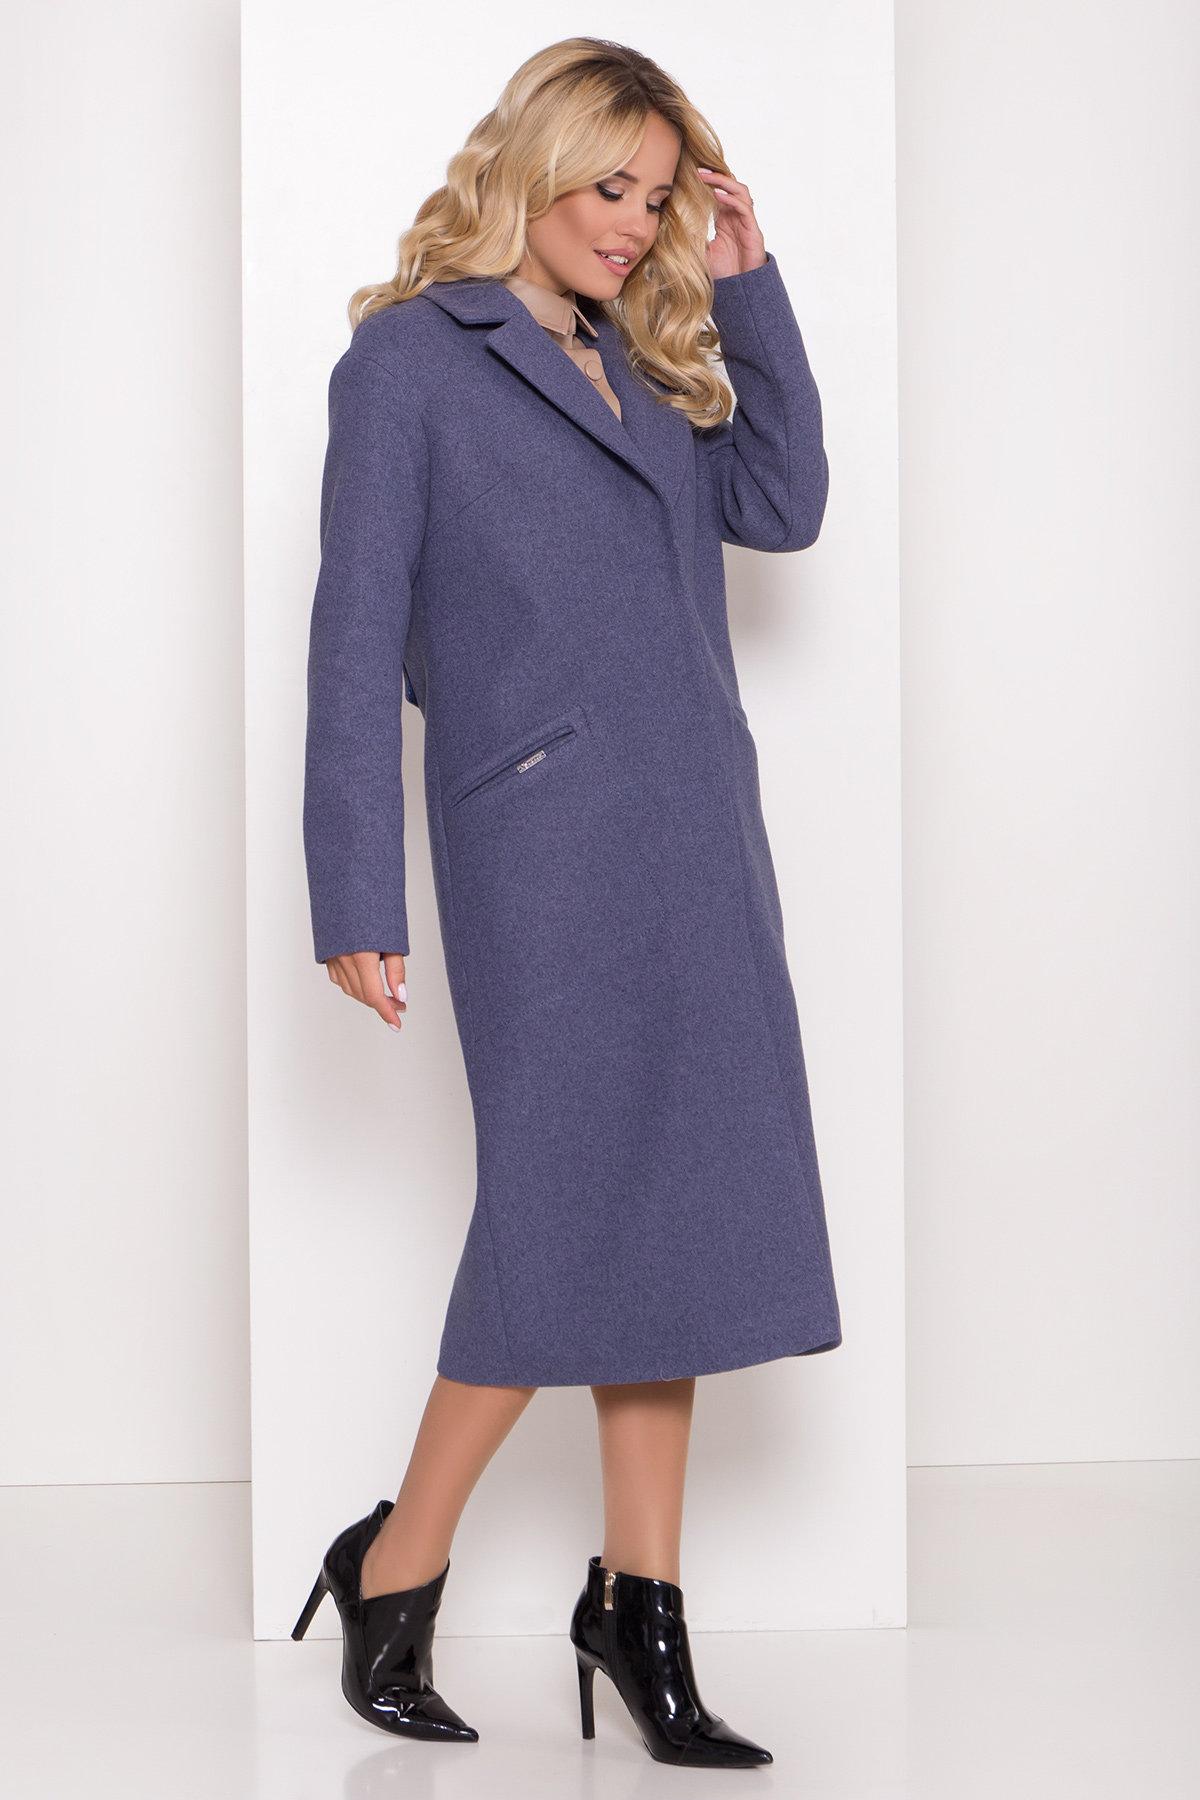 Пальто Ждана лайт макси 8190 Цвет: Джинс